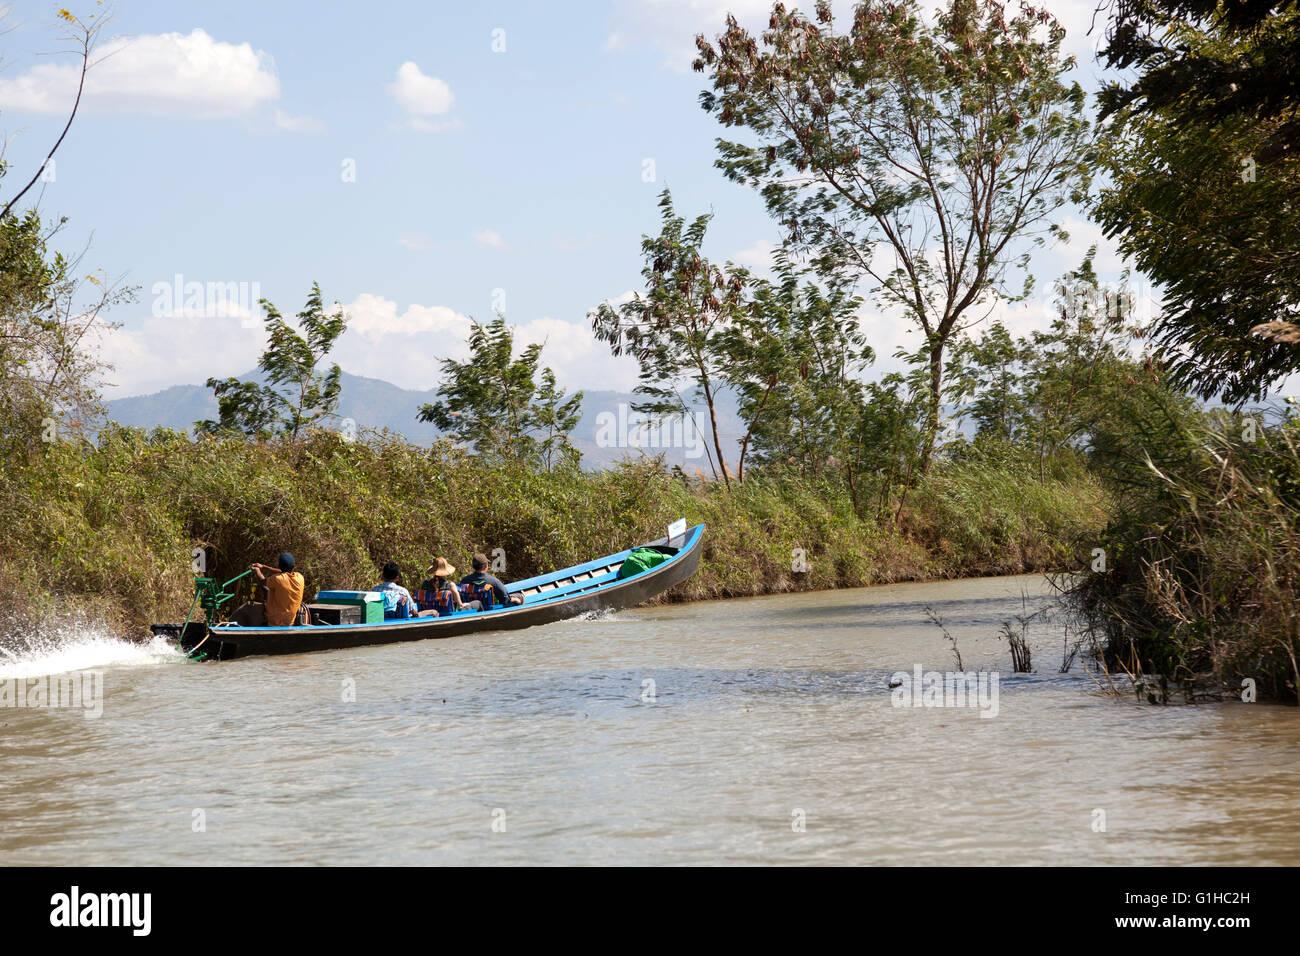 A motorized craft carrying tourists, near Inthein (Myanmar). Embarcation motorisée transportant des touristes, - Stock Image